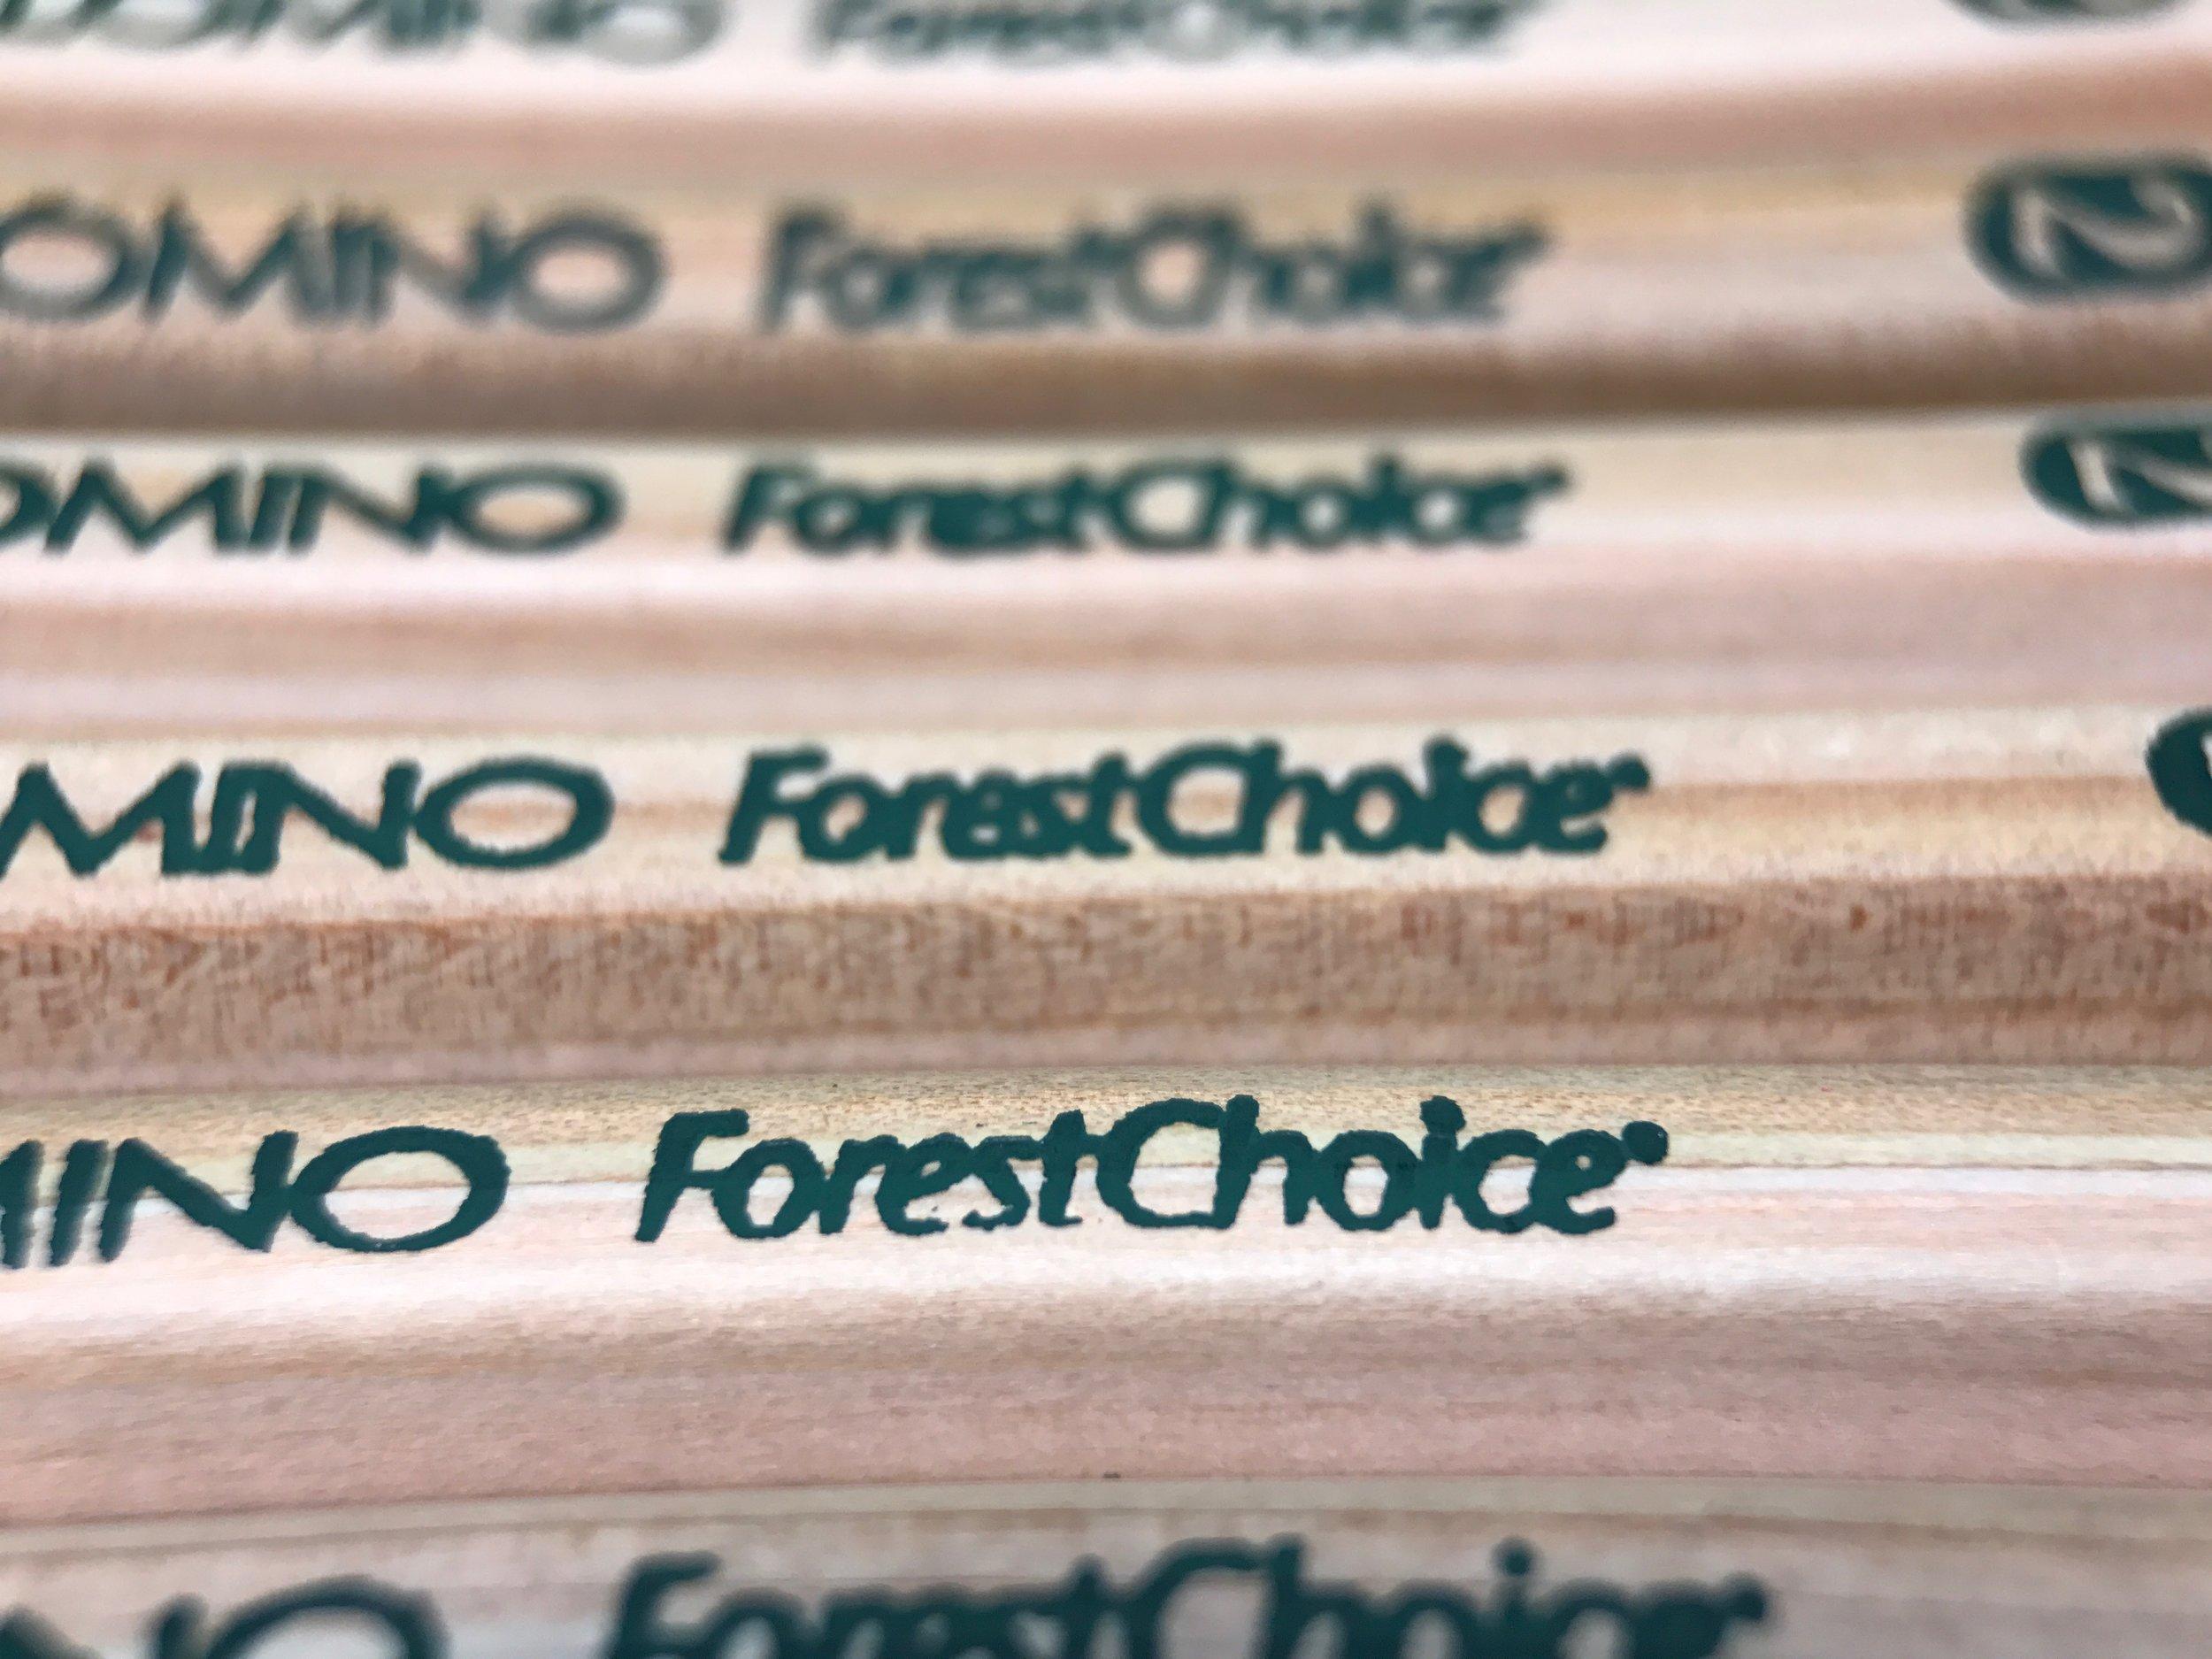 palomino-forest-choice-pencil-7.jpg